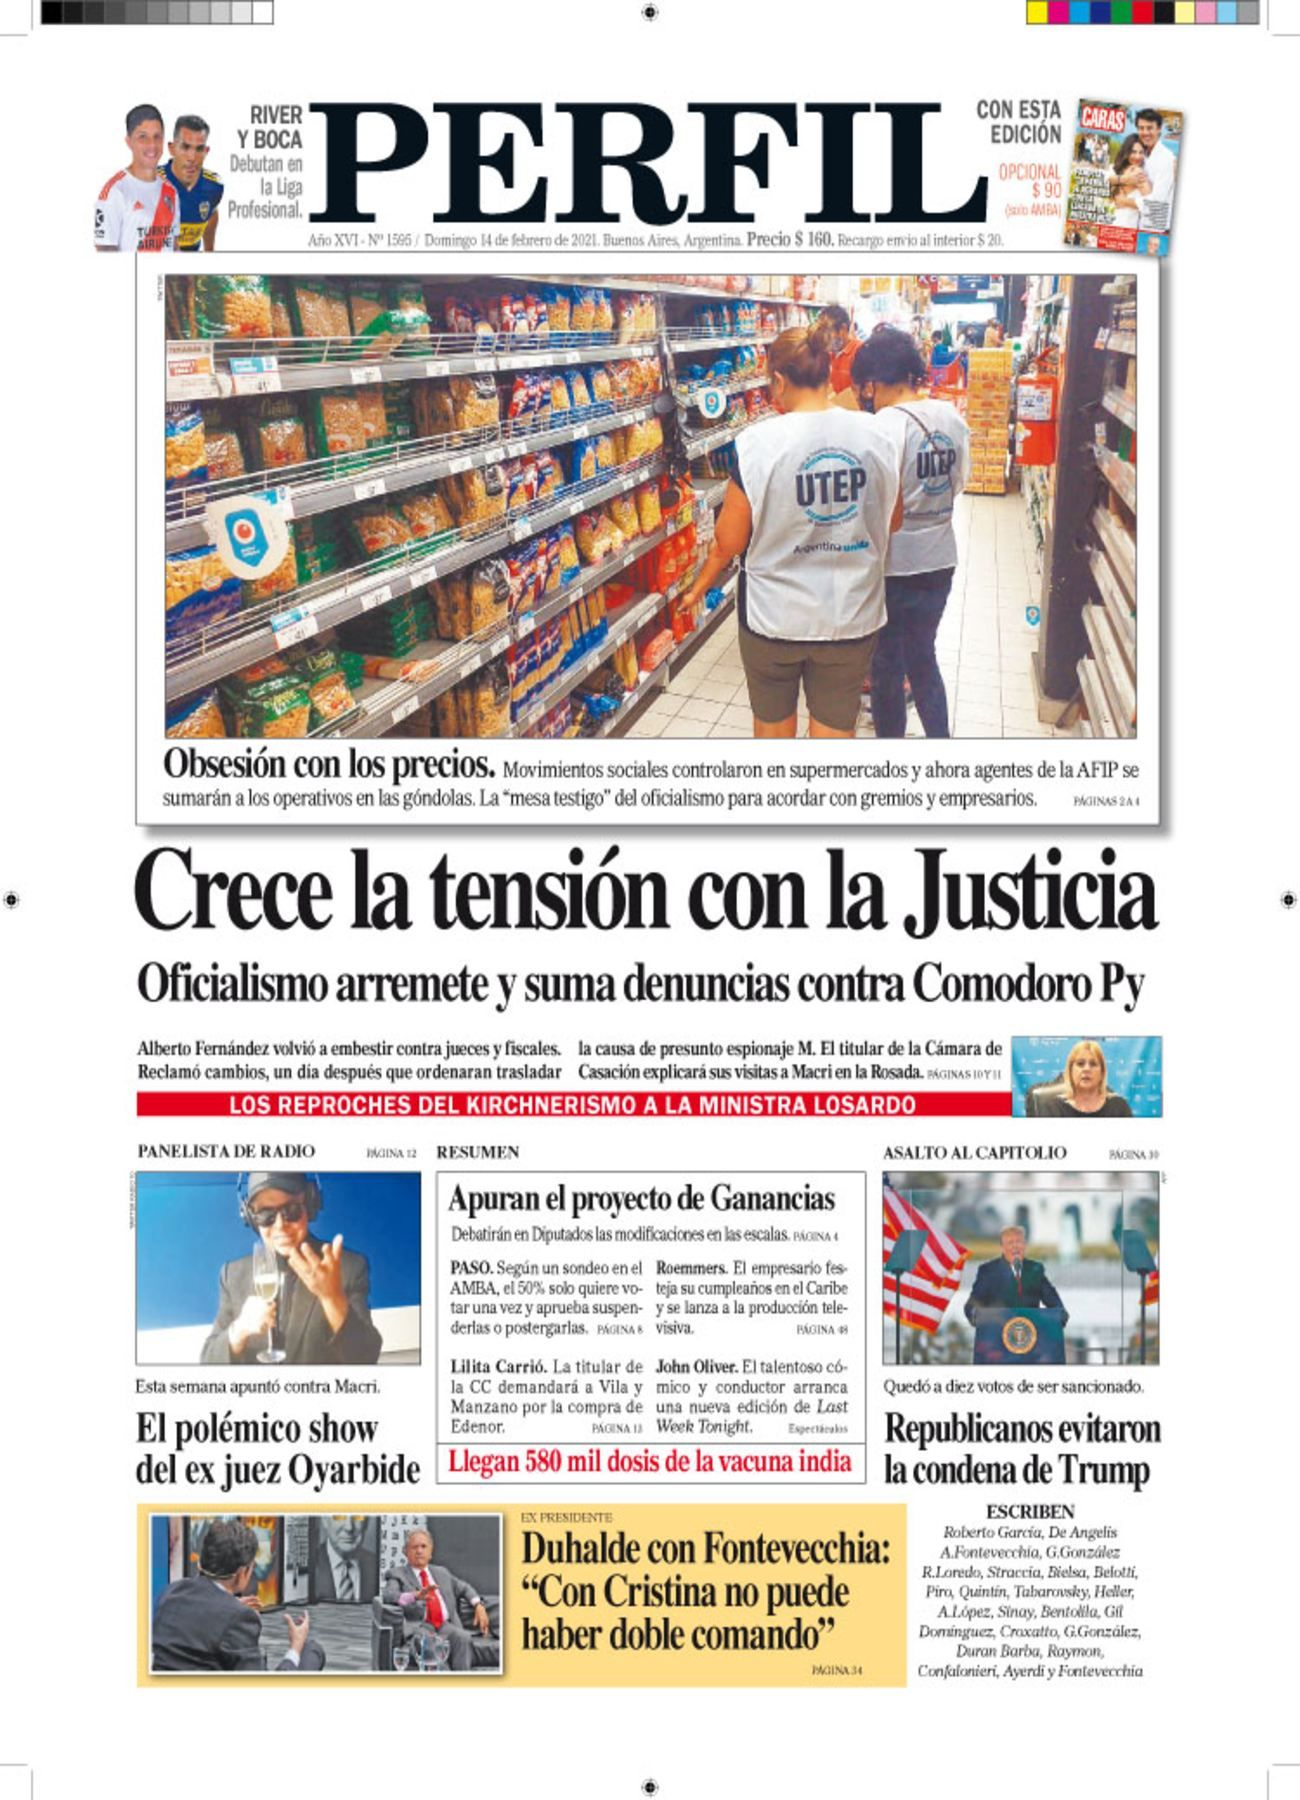 La tapa del Diario PERFIL de este domingo 14 de febrero.